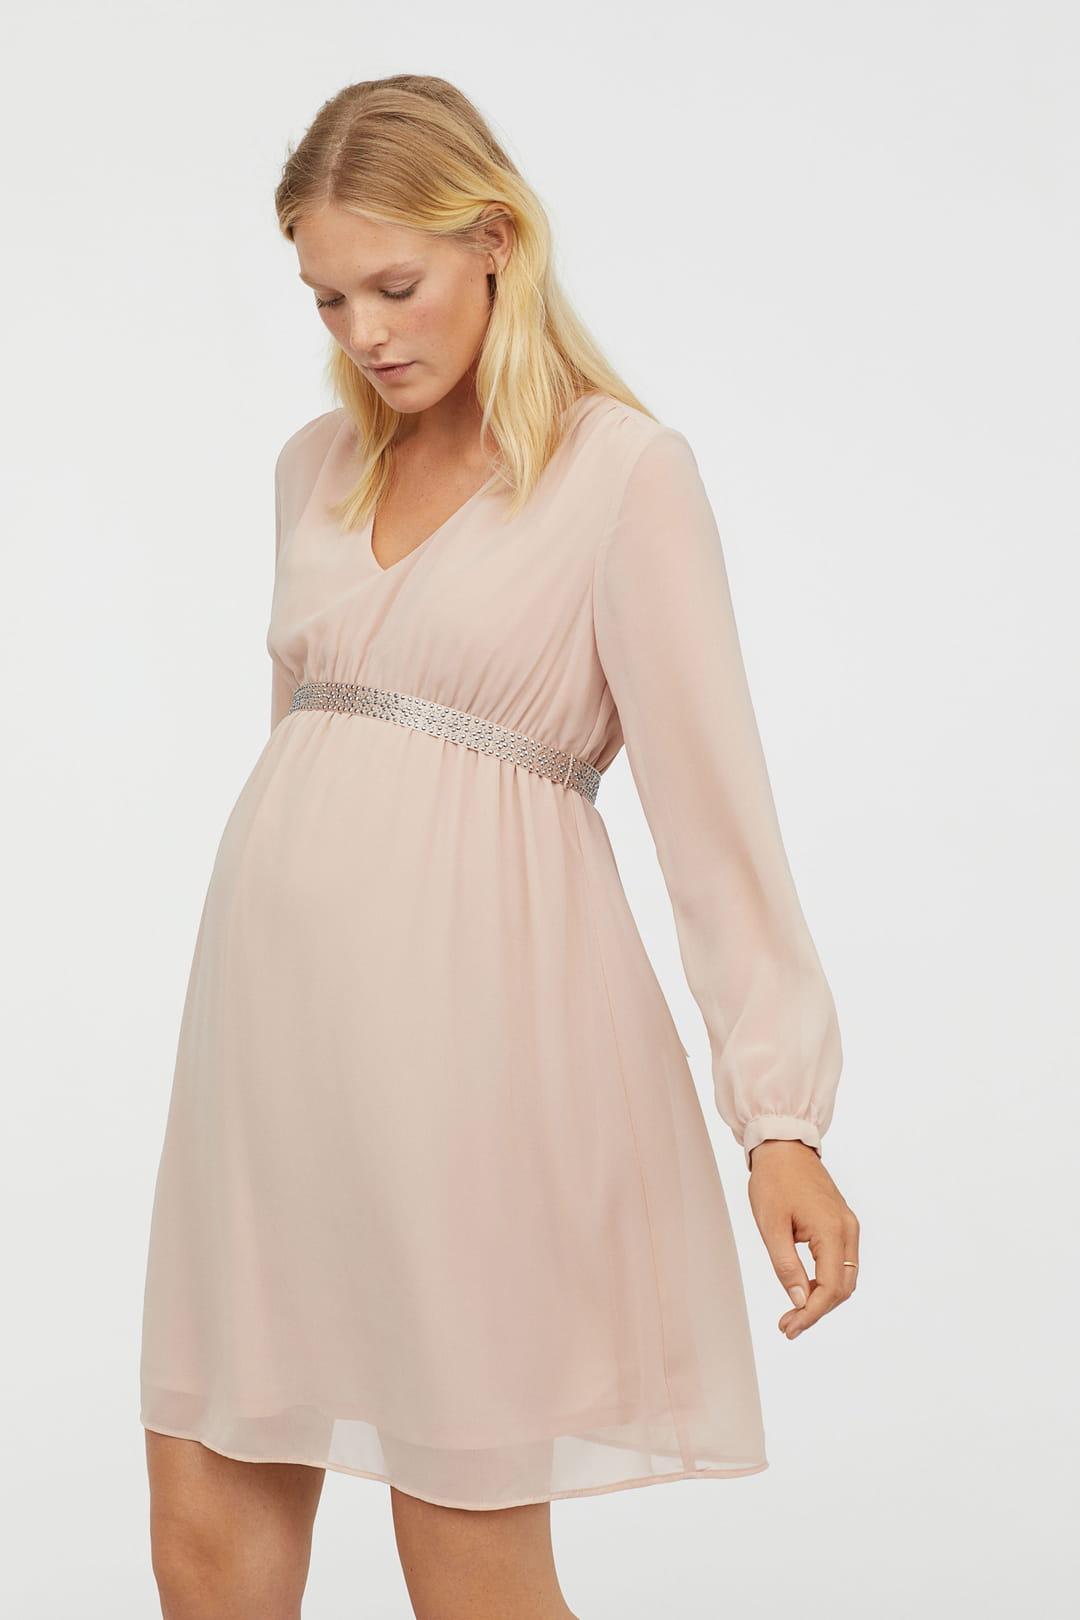 67937f204d0 Robe de grossesse avec ceinture. Prix   34